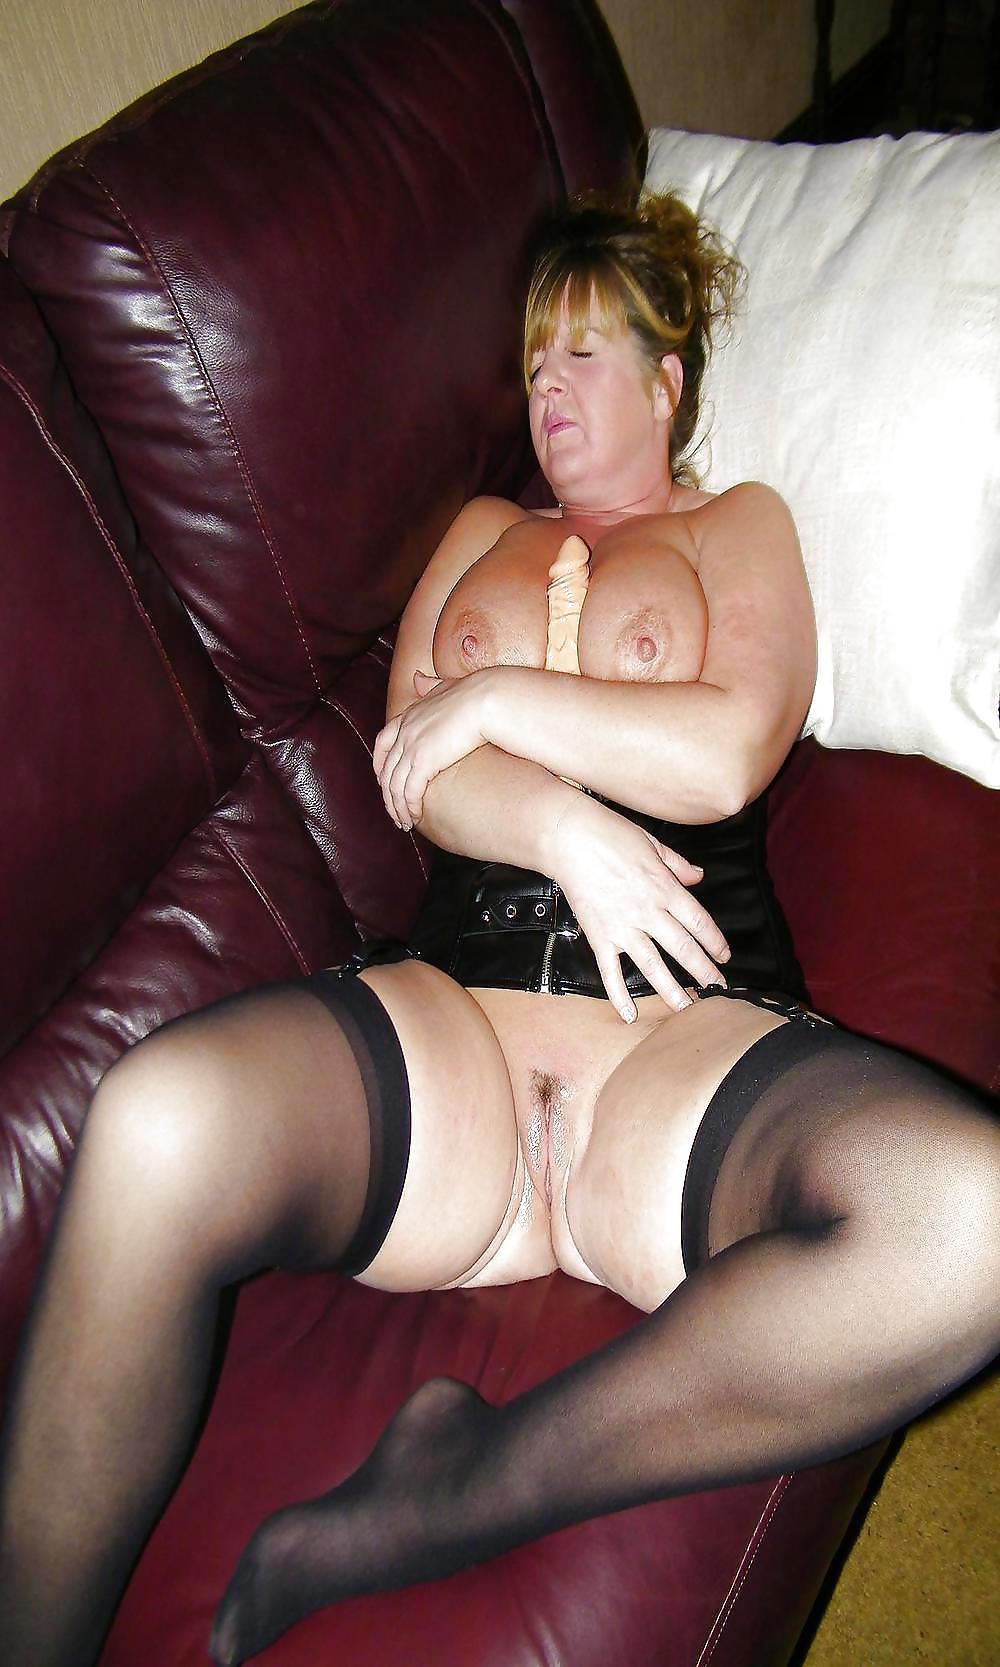 Mature women tits pics